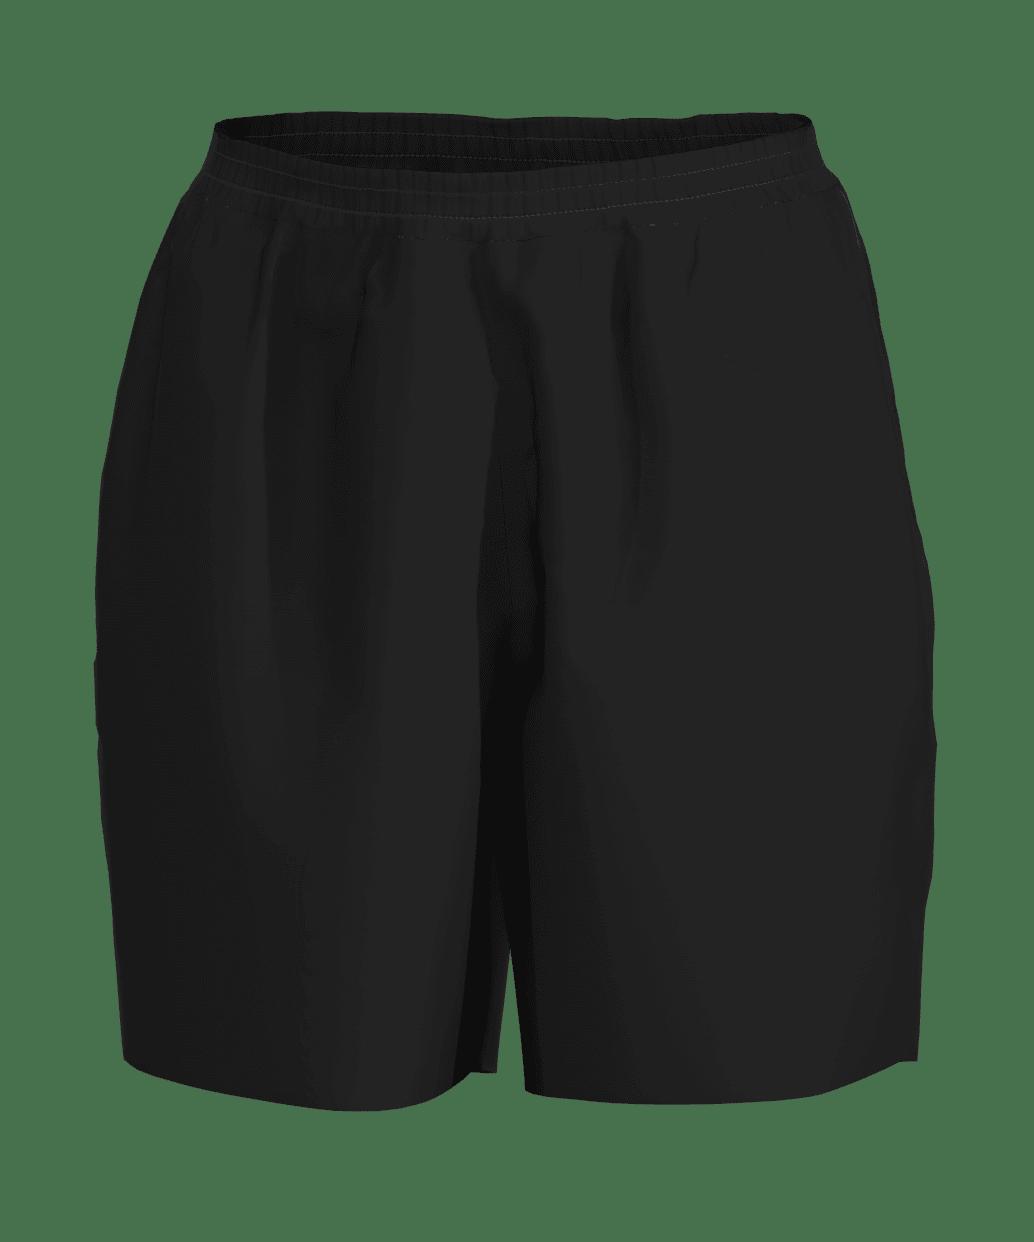 unisex sport shorts men 3d black